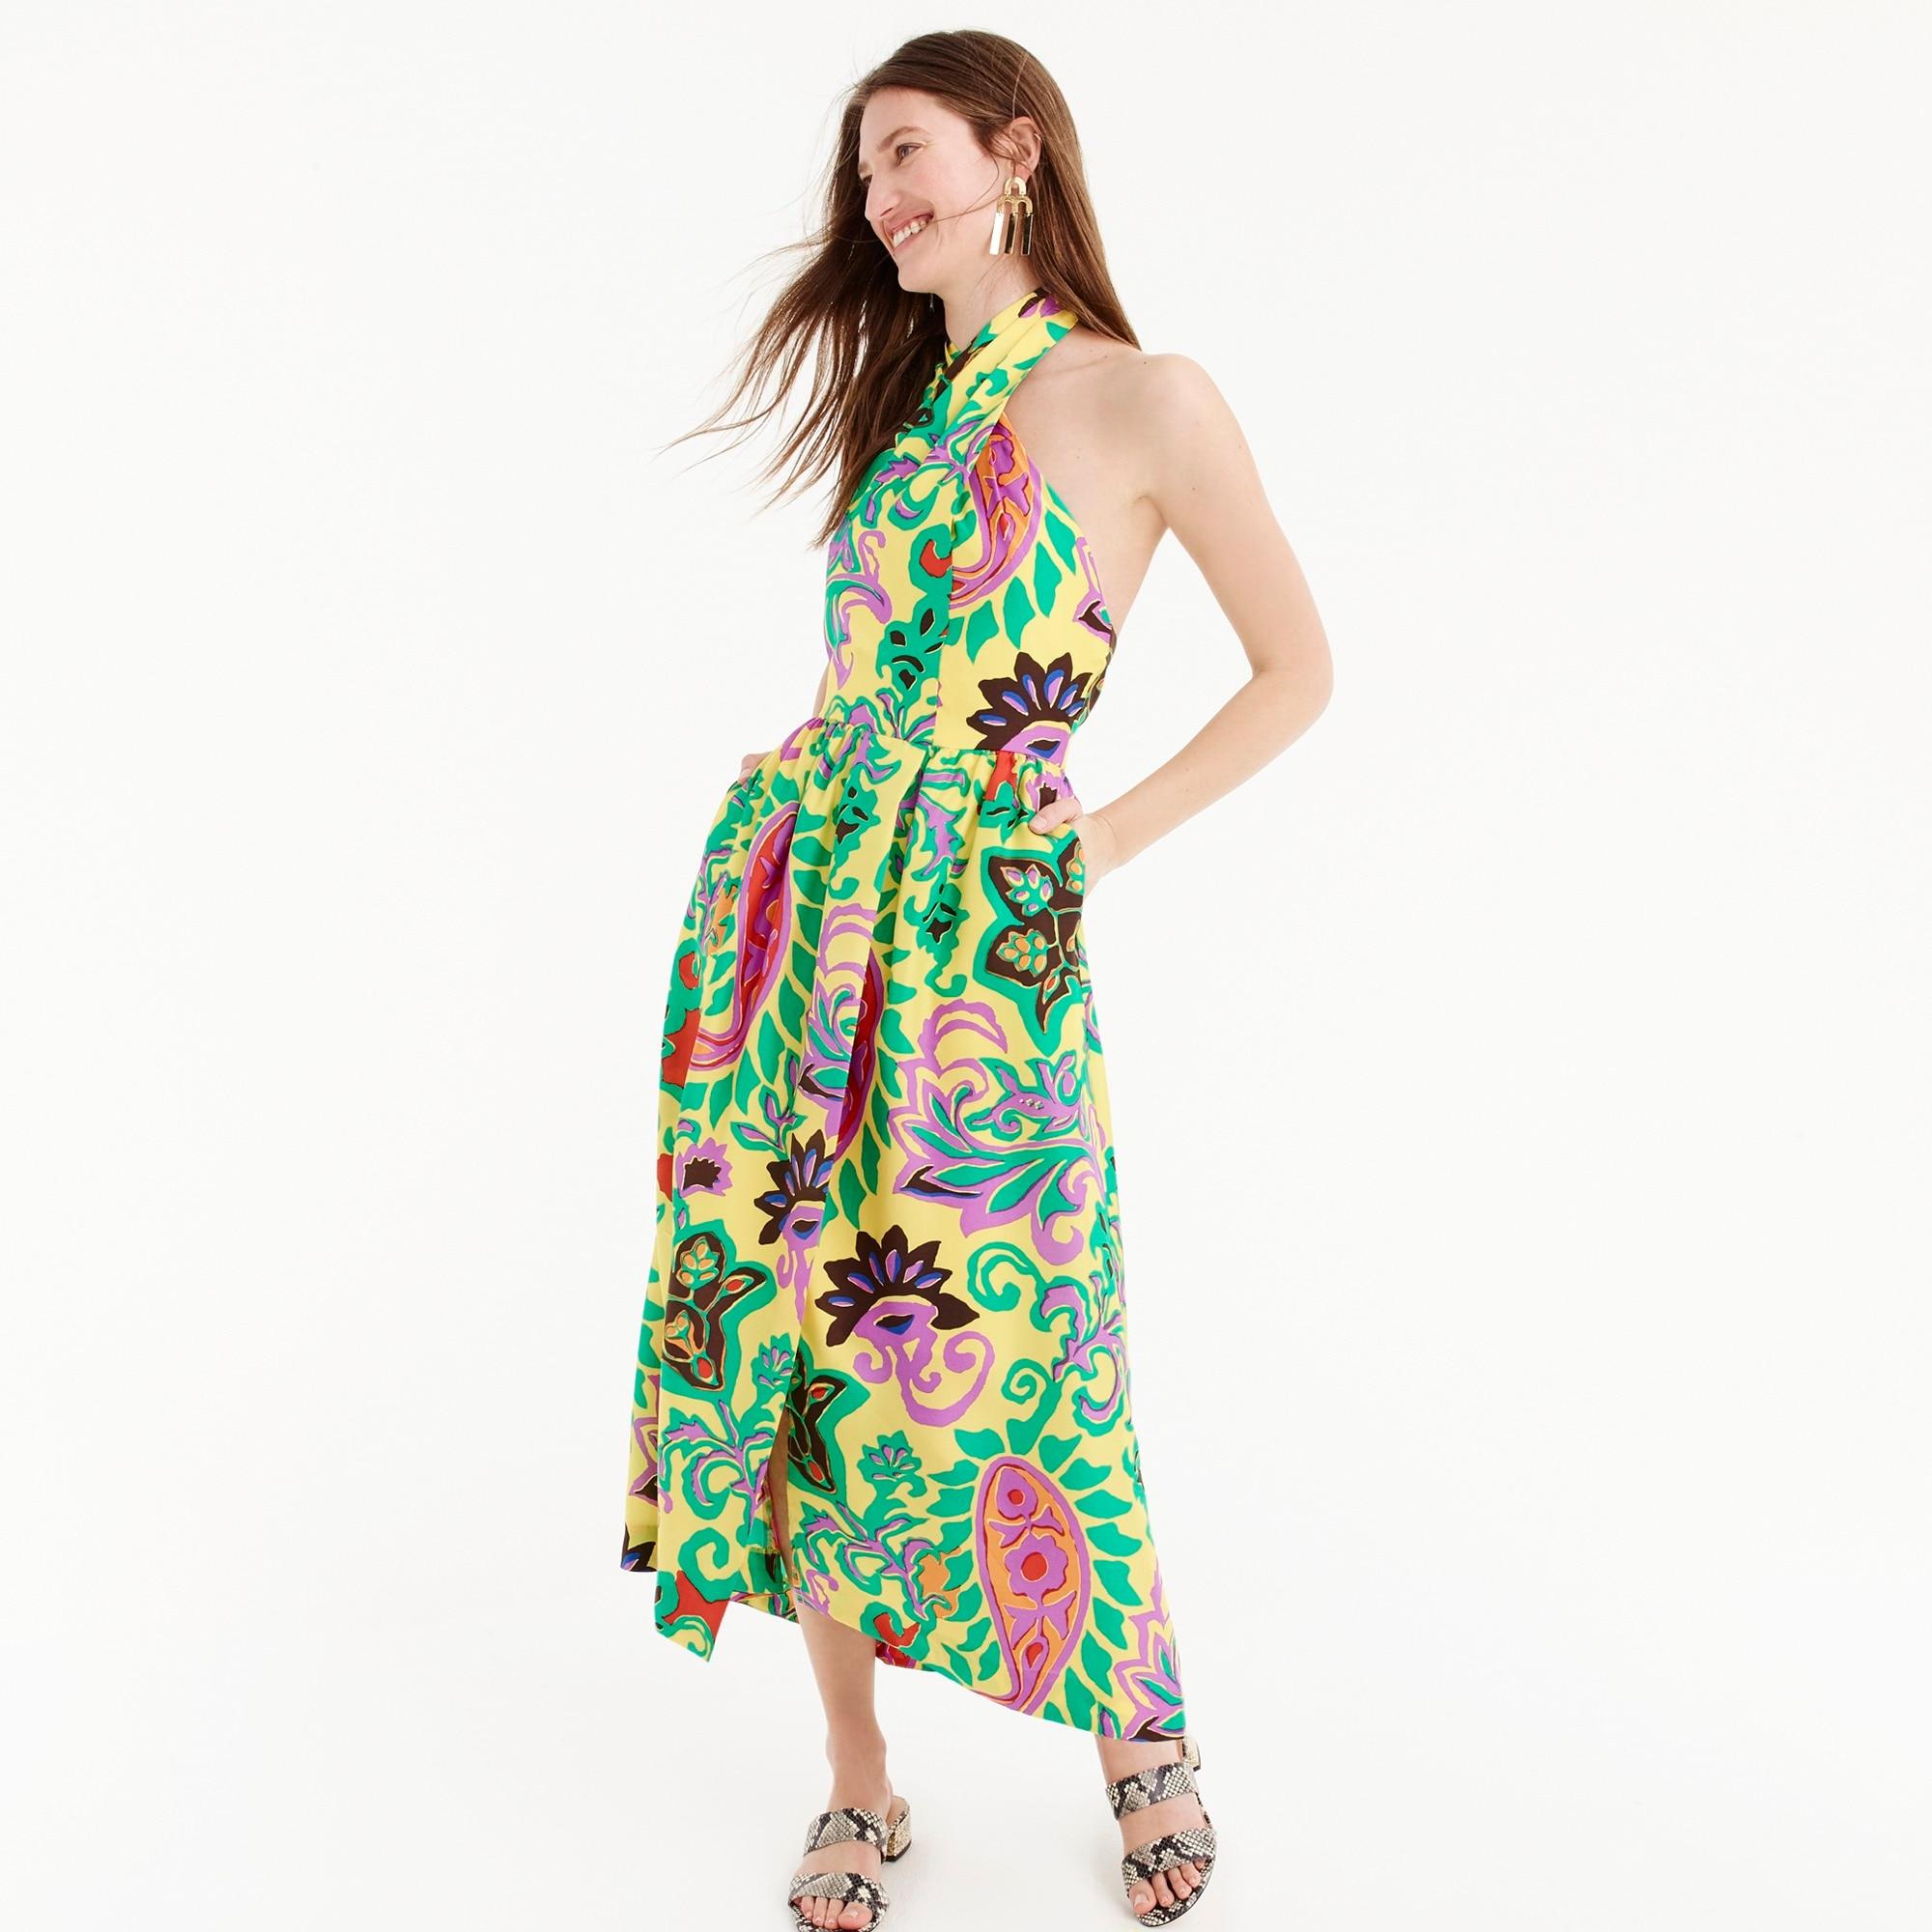 women's silk maxi sarong dress in paisley - women's dresses